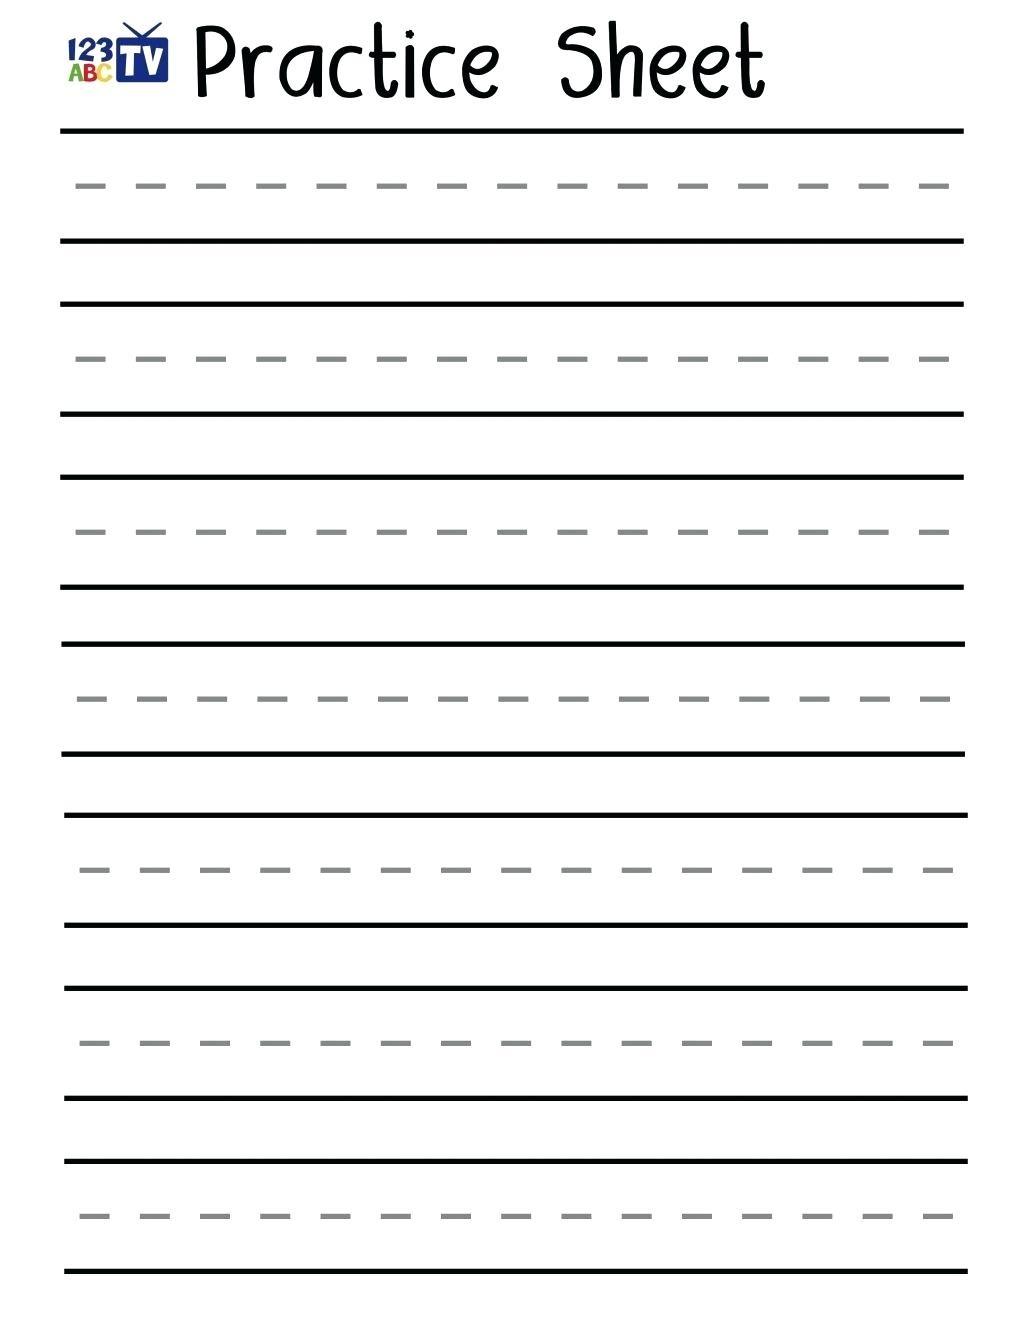 Practice Writing Sheets – Shoppingforu.club - Blank Handwriting Worksheets Printable Free